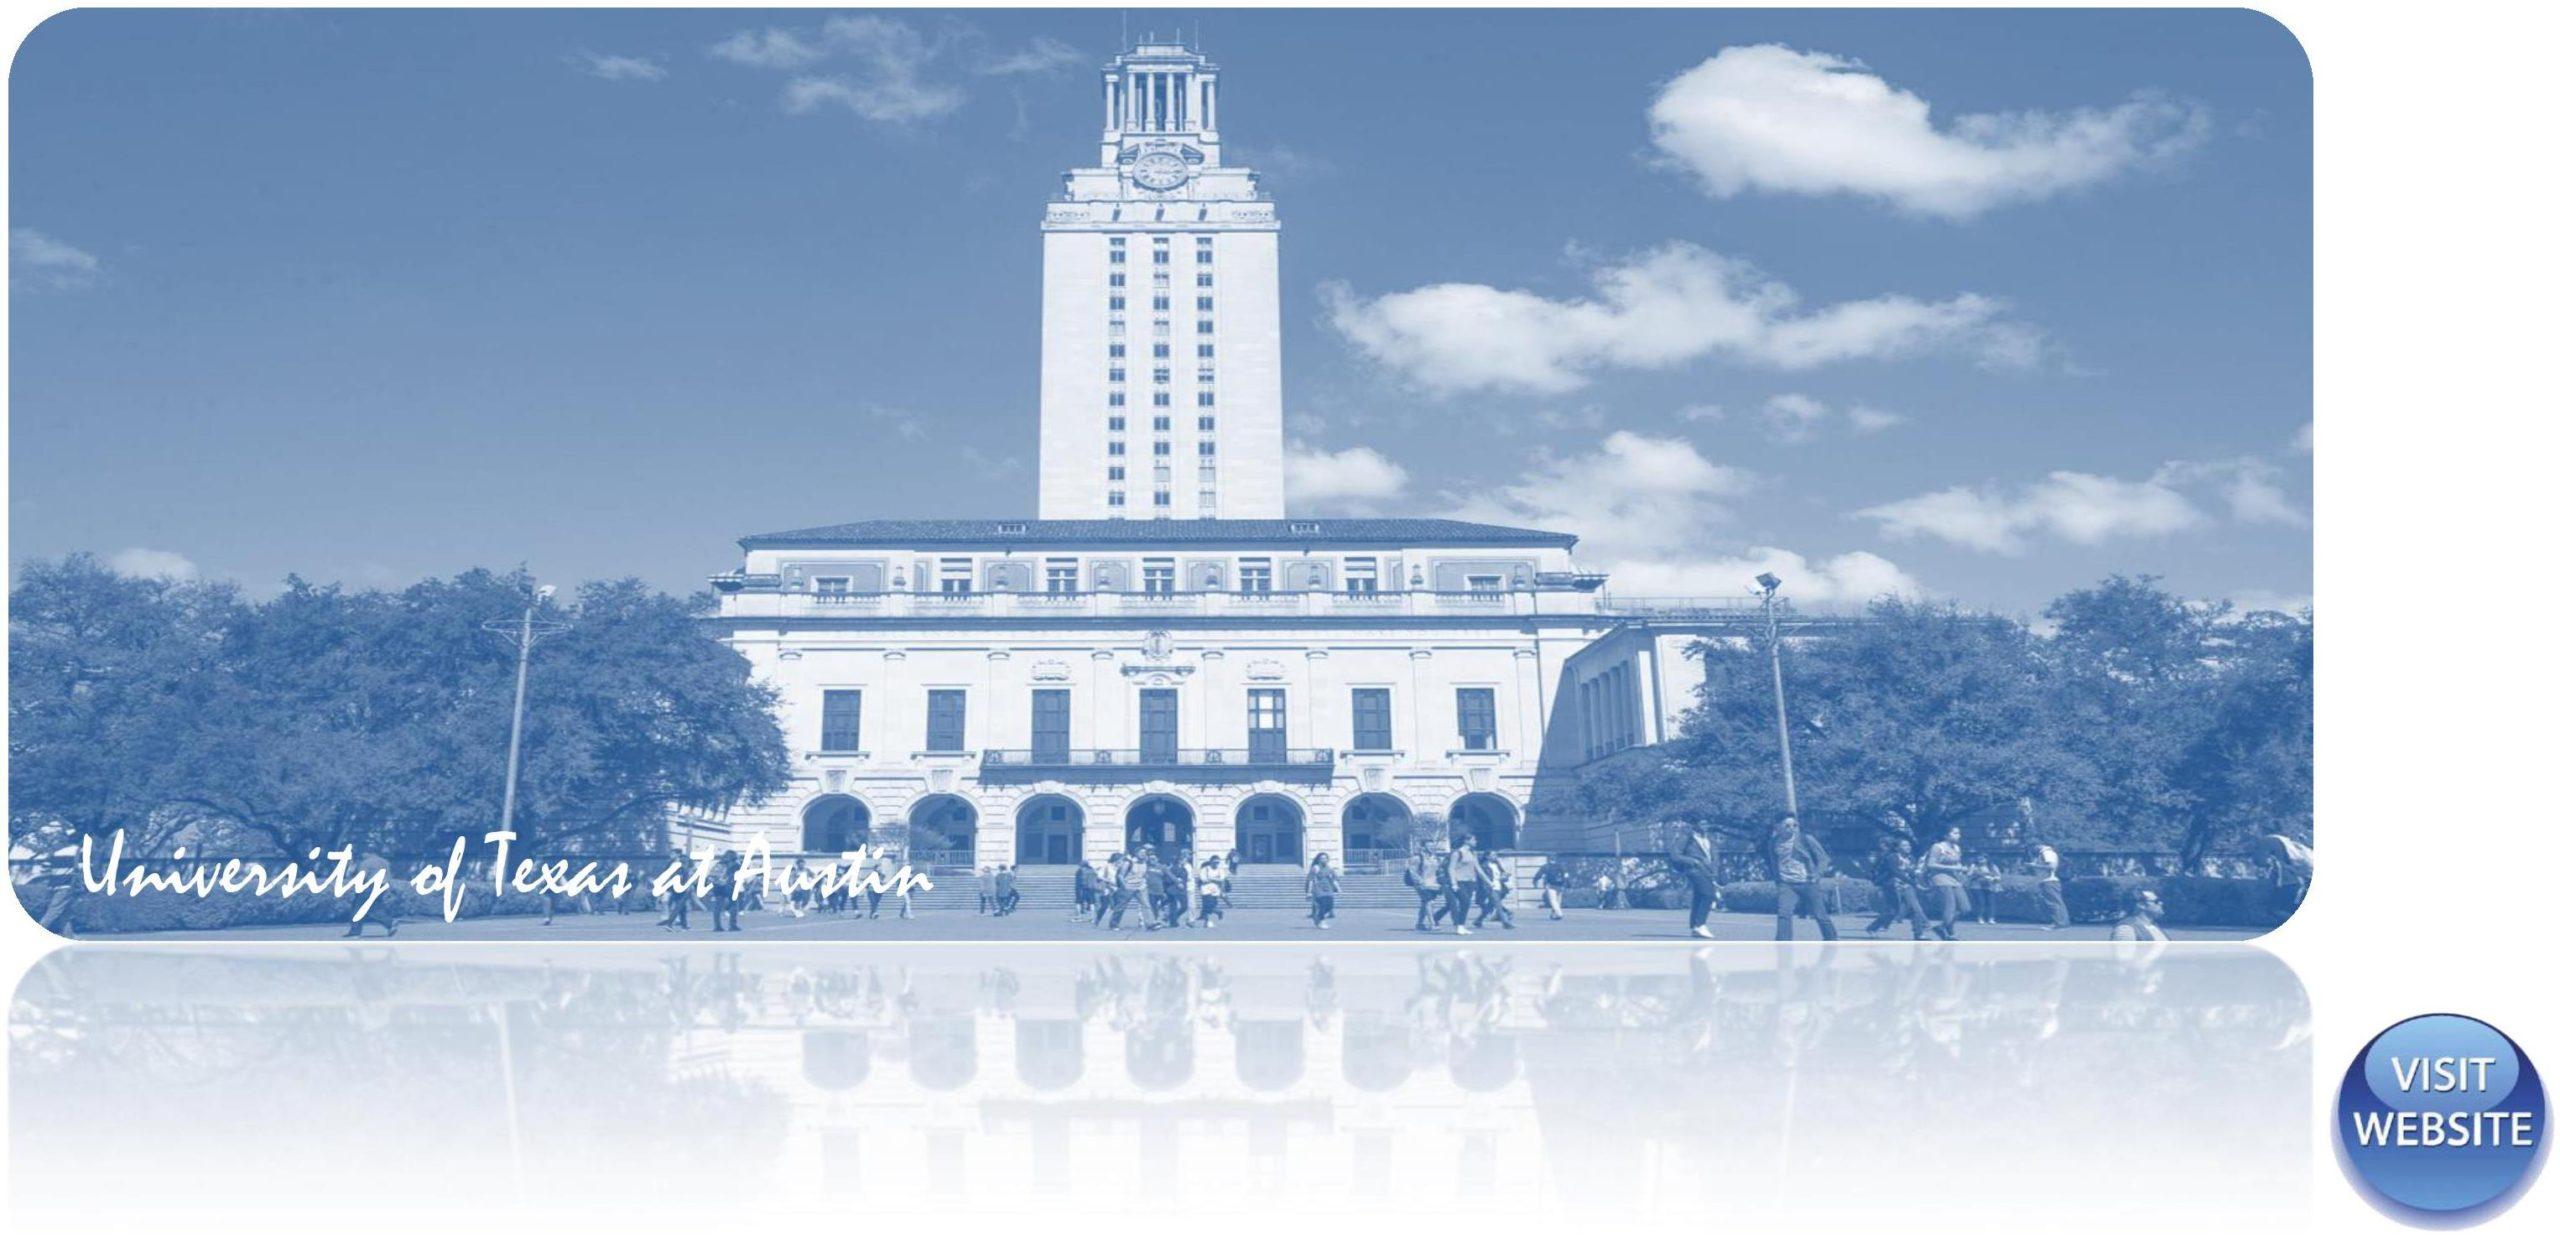 University of Texas at Austin USA